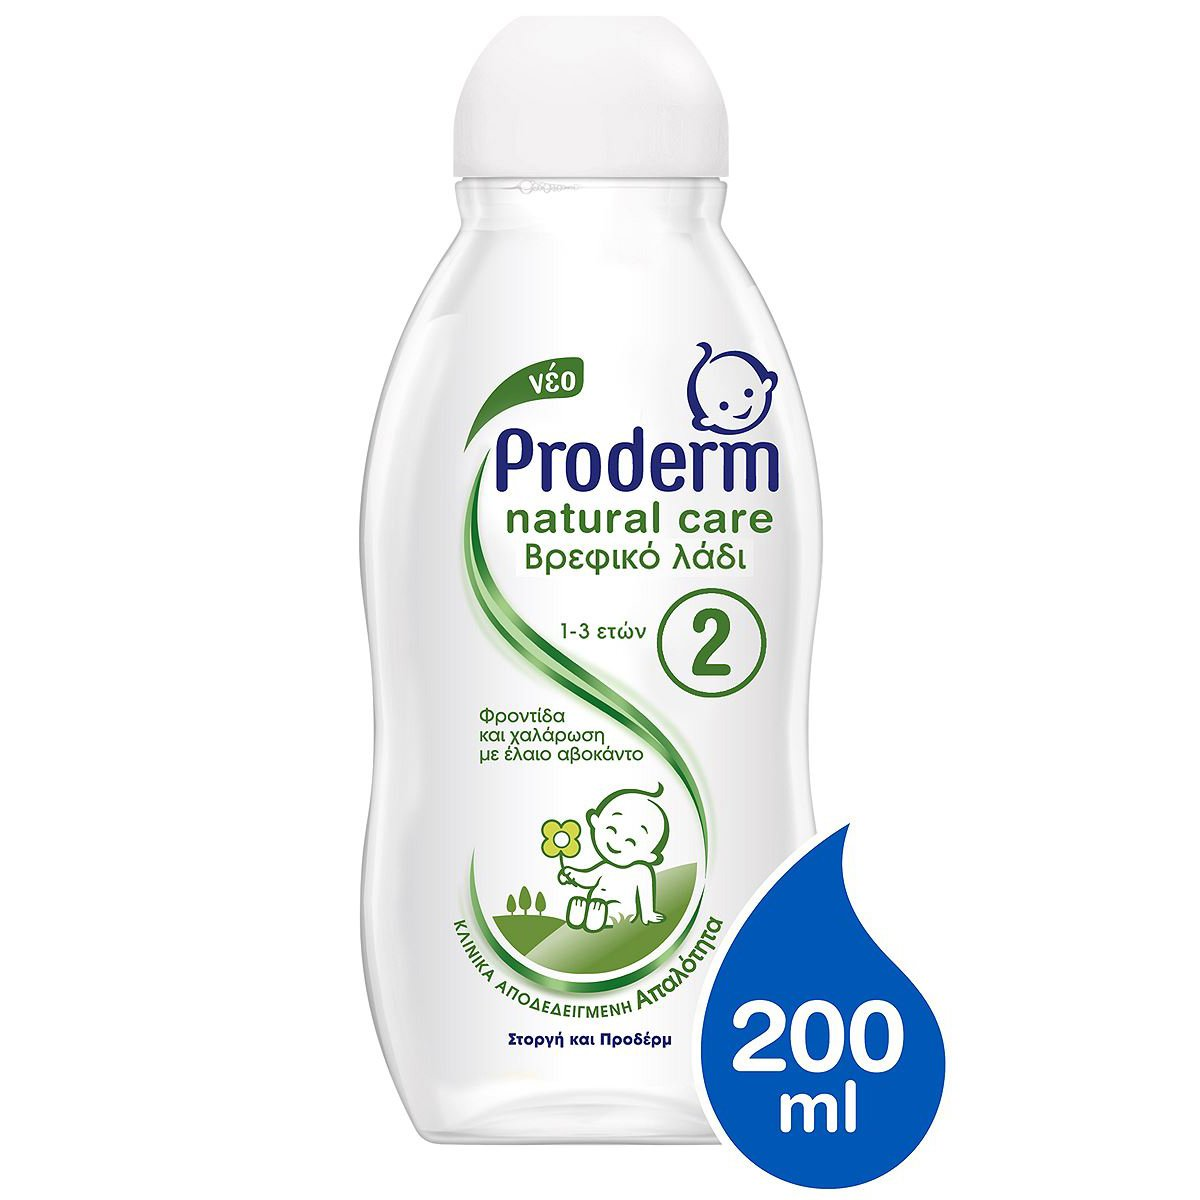 Proderm Natural Care Βρεφικό Λάδι με Έλαιο Αβοκάντο 1-3 Ετών 200ml